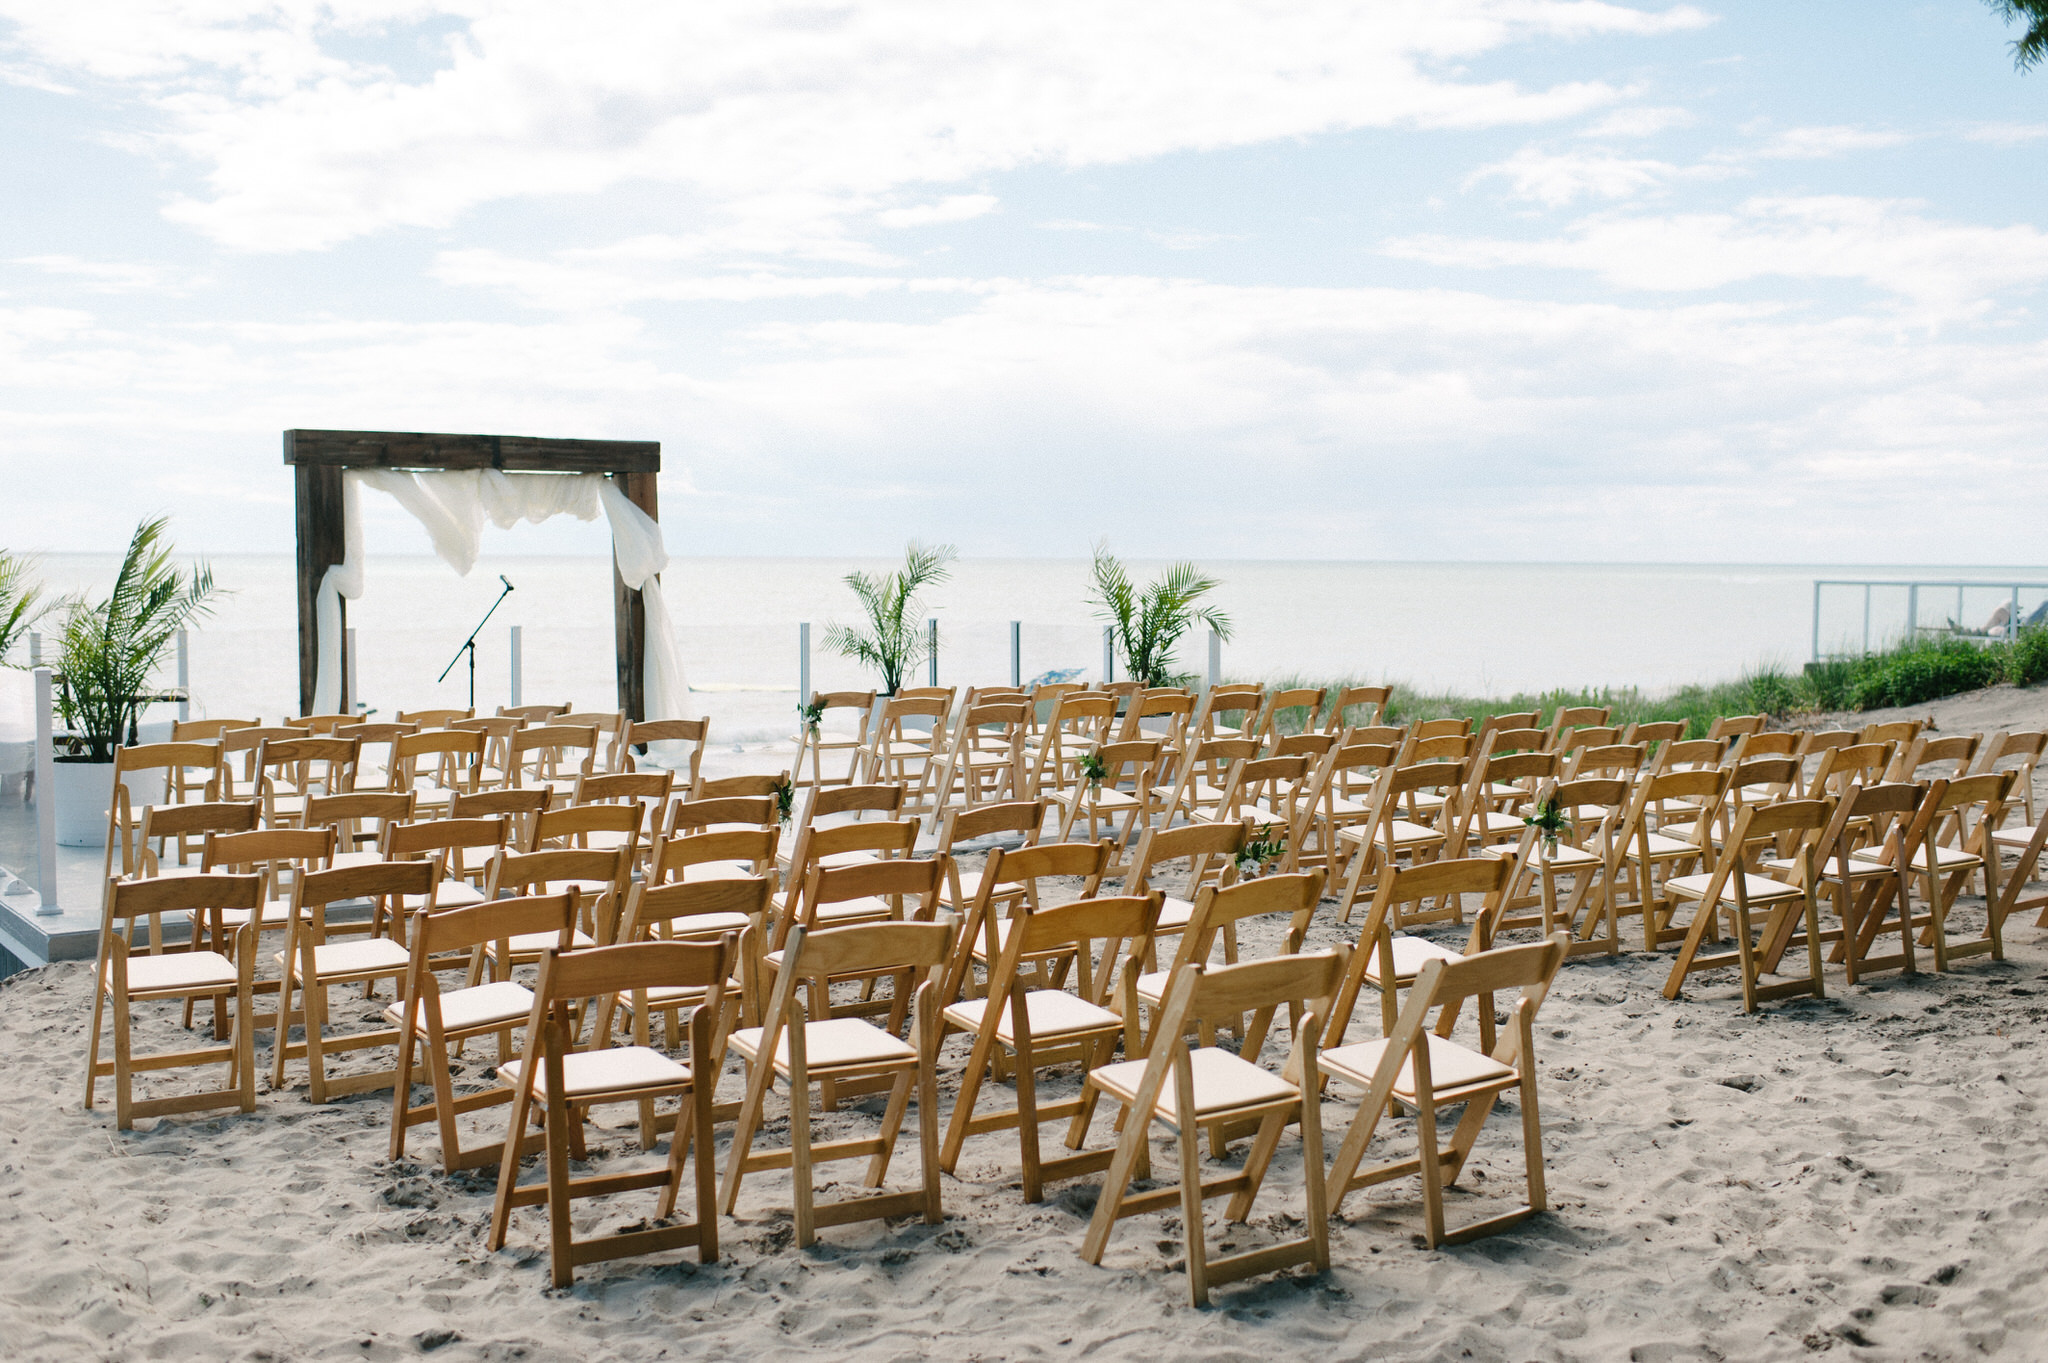 toronto wedding photography scarlet oneill015.JPG